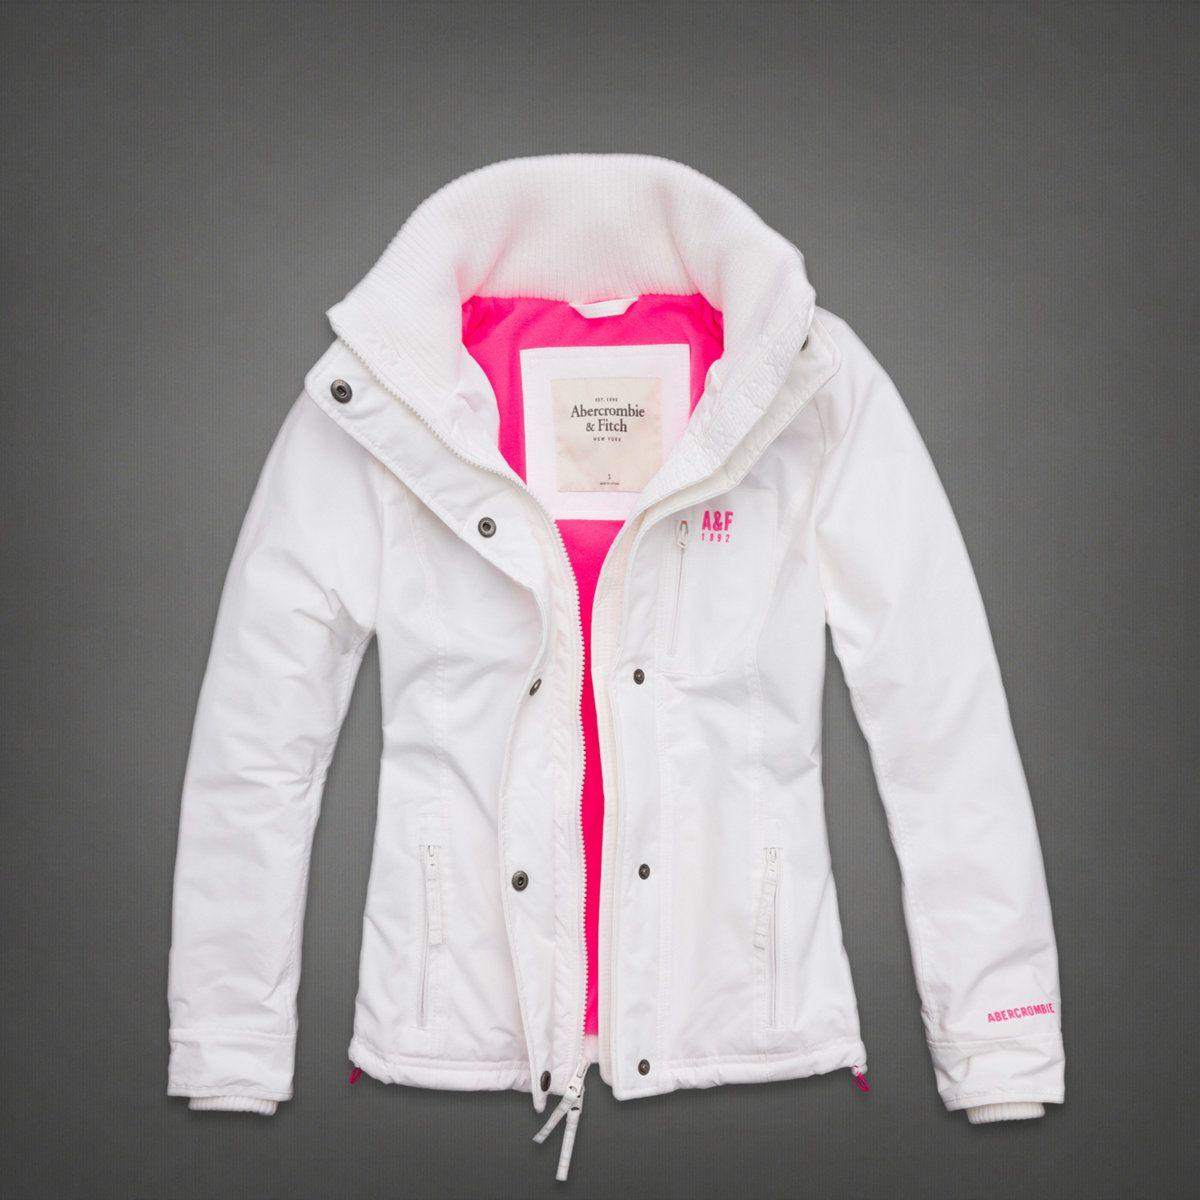 129d11b29 Womens A All-season Weather Warrior Jacket | Womens Outerwear ...